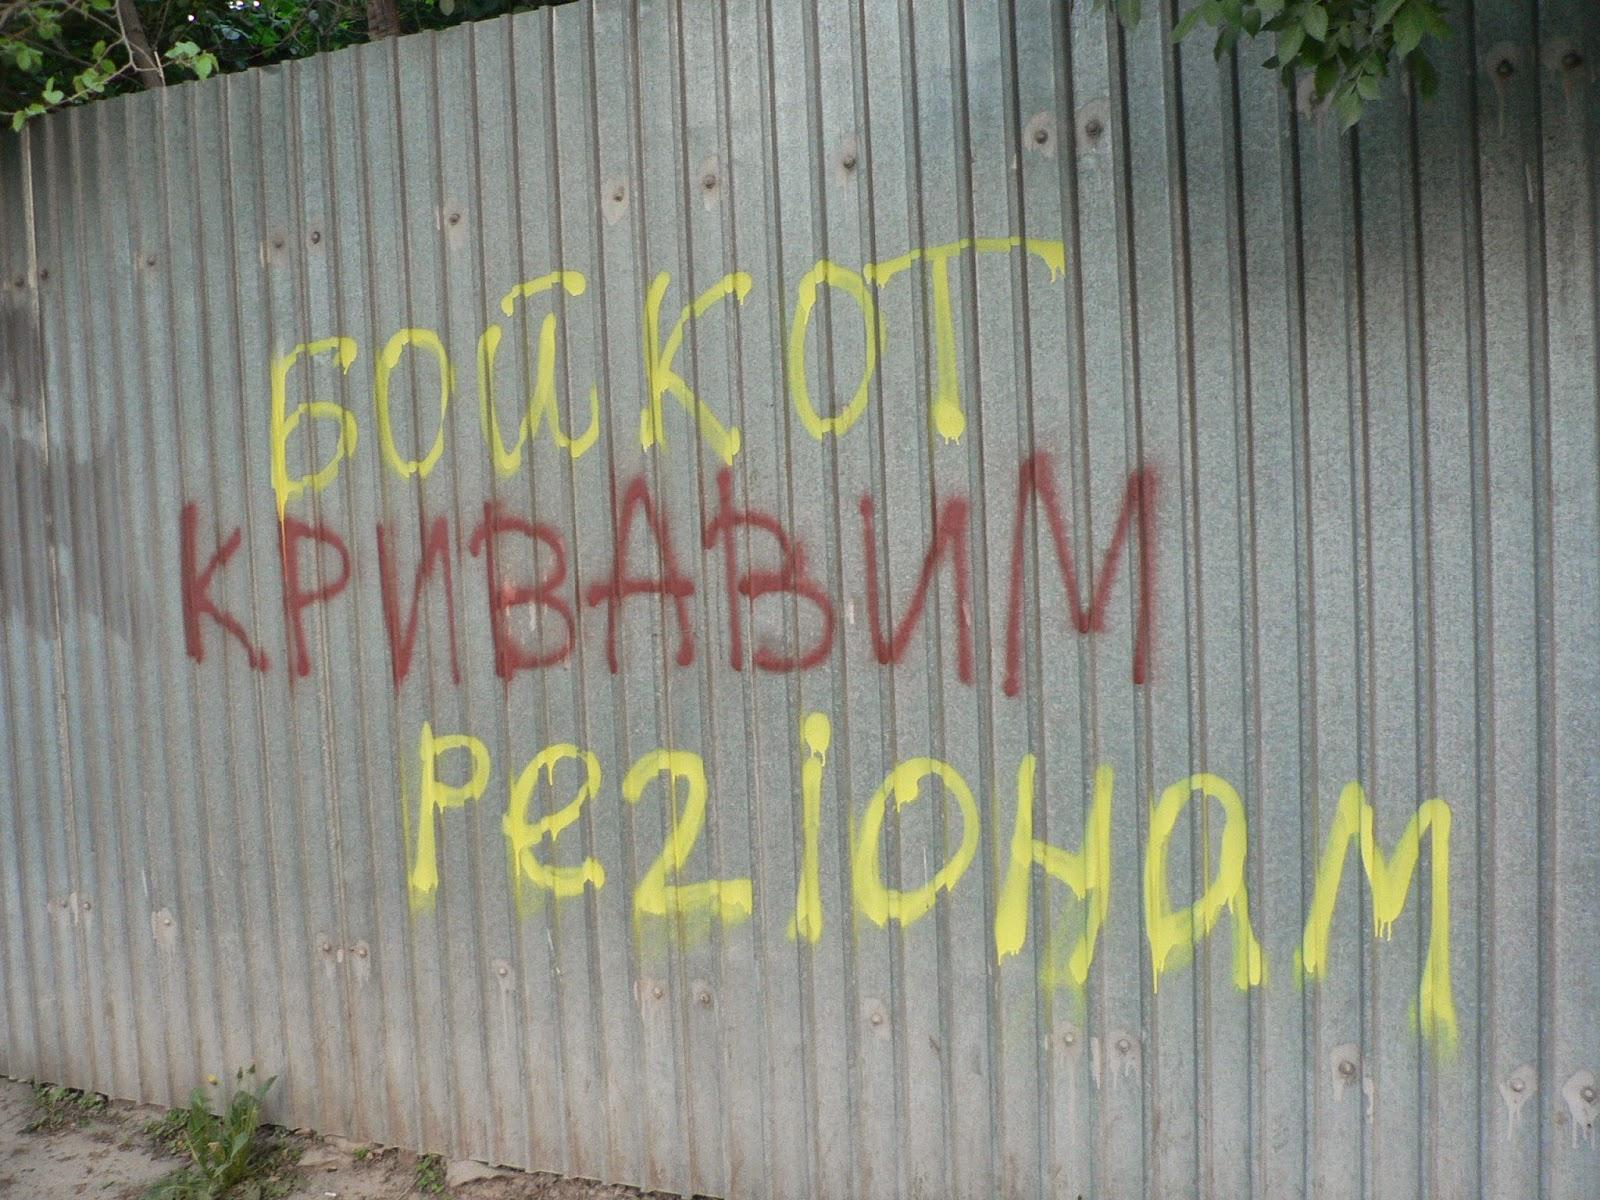 Бойкот-Кривавим-Регионам